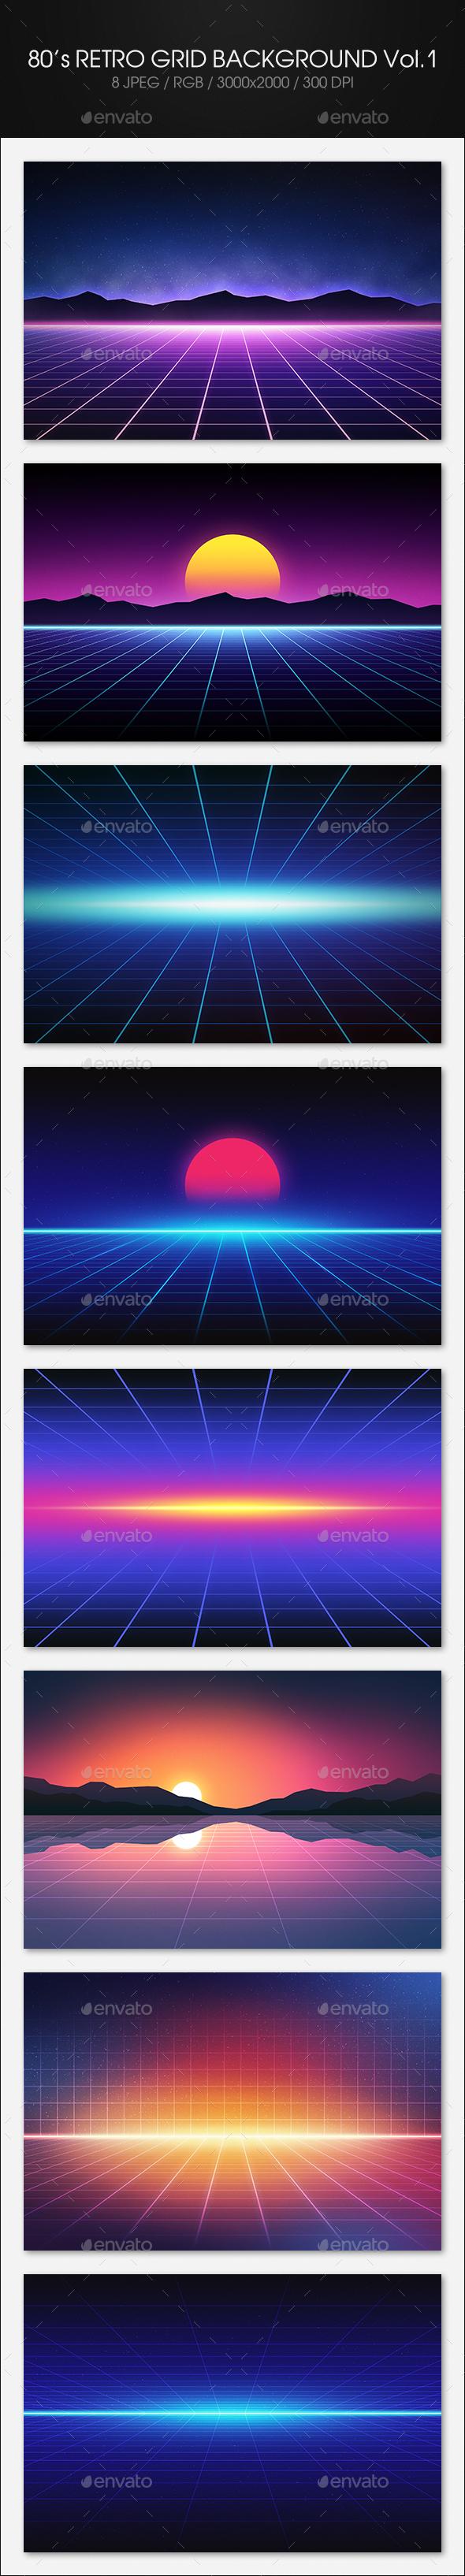 80's Retro Grid Background Vol.1 - Tech / Futuristic Backgrounds